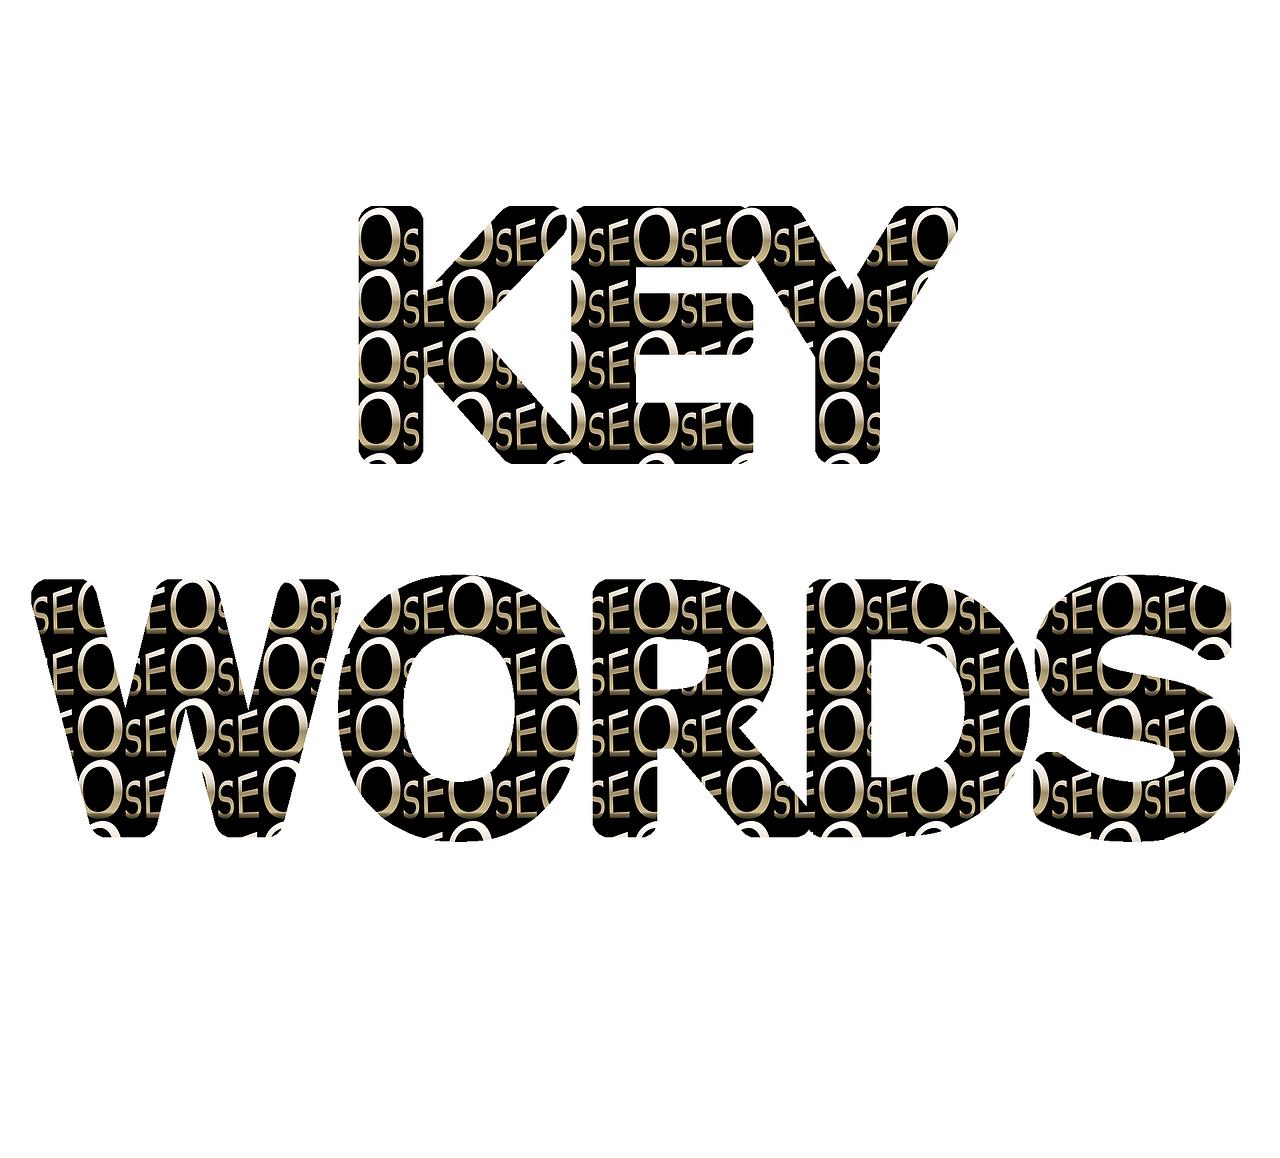 SEO копирайтинг, подбор ключевых слов и семантика сайта